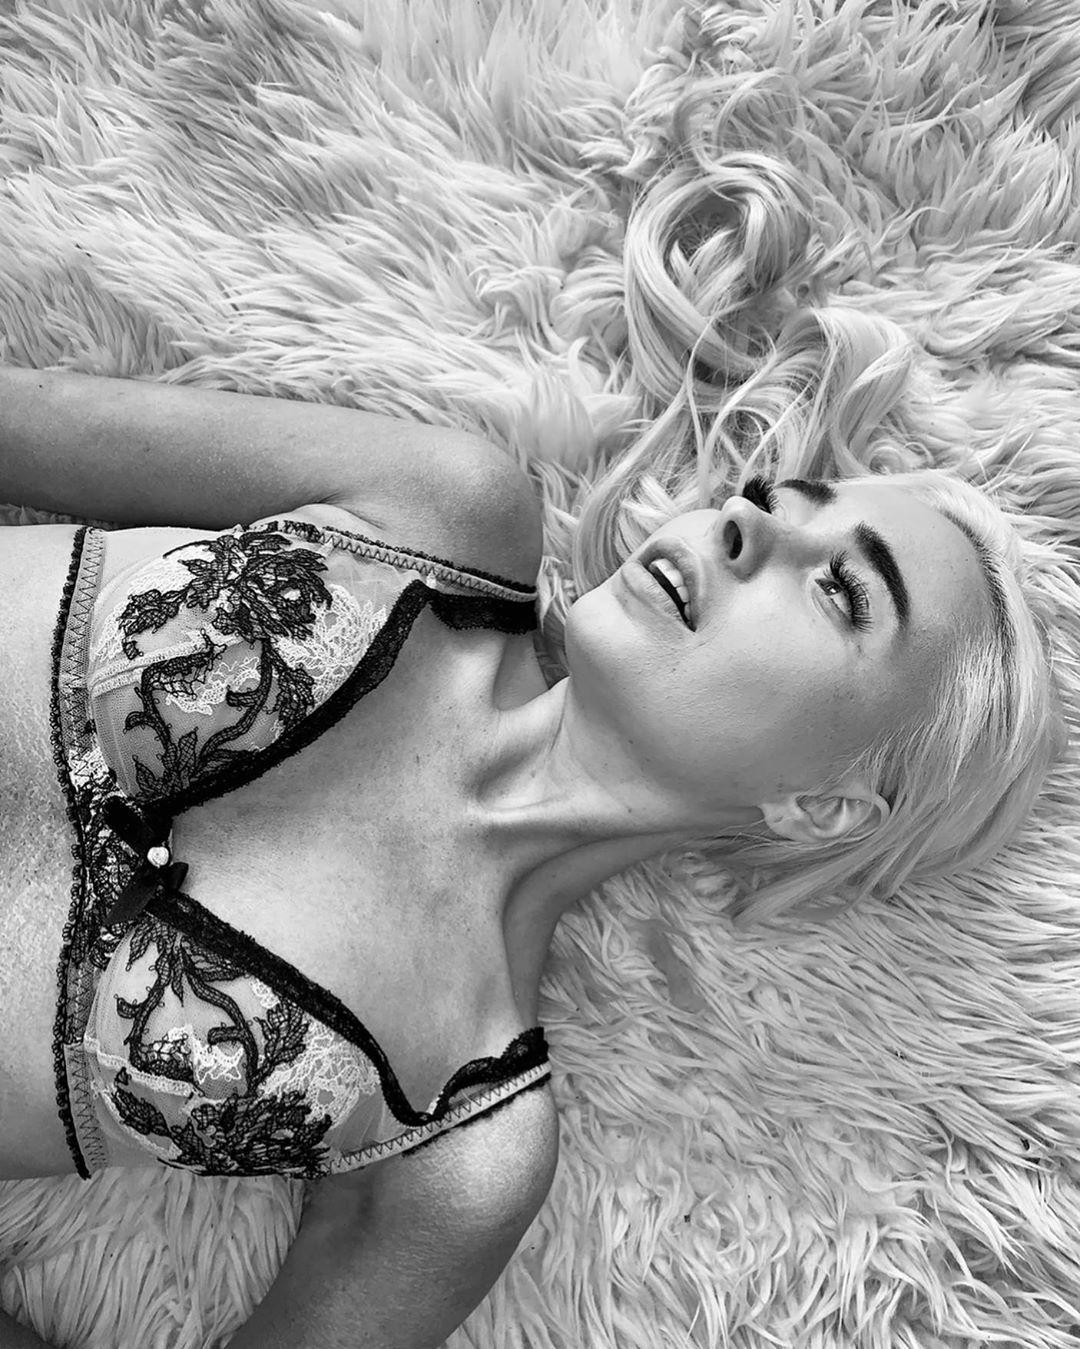 Wolf of Wallstreet 💎💎💎💎 @luciusjamesiv @agentprovocateur #playboyplaymate#playboymodel#internationallypublishedmodel#lingeriemodel#agentprovocatuer#playmate#lingeriemodellife#lamodel#centerfold#petite#blonde#thin#slim#fit#babesofinstagram#sexy#covergirl#classy#luxurylifestyle#luxelady#la#beverlyhills#westhollywood#goodvibes#lawofattraction#instagood#instafame 💎💎💎💎